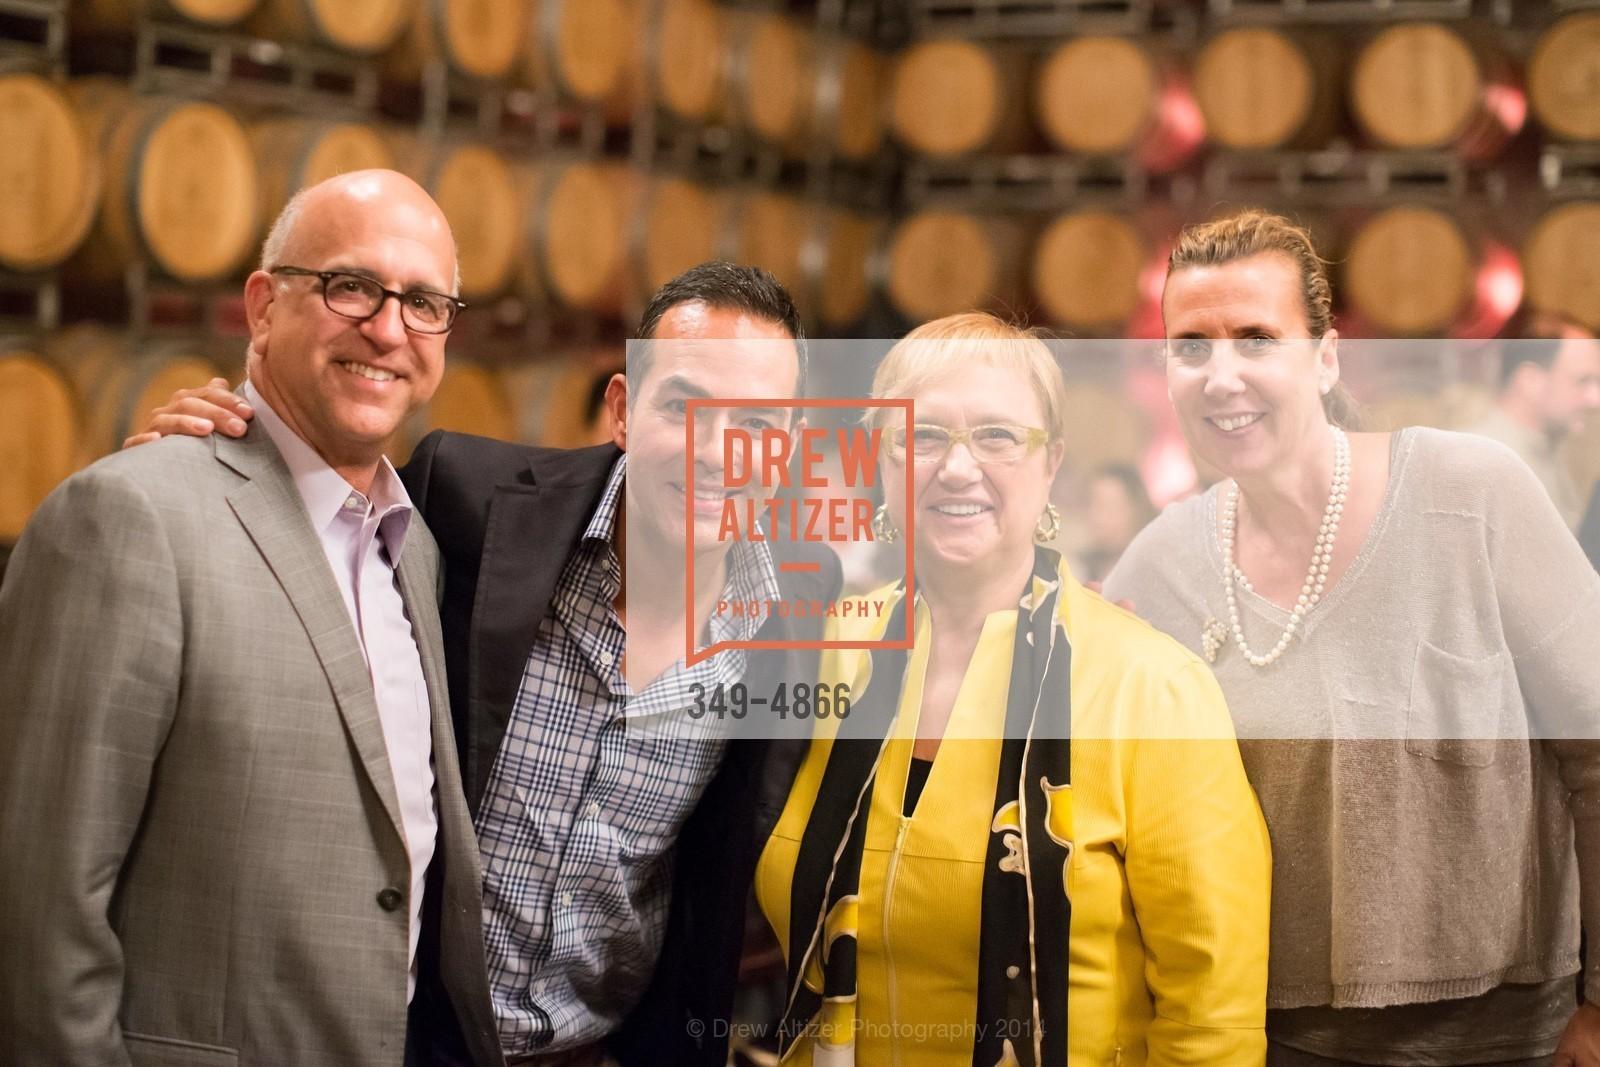 Ken Monnens, Greg Lopez, Lidia Bastianich, Gina Gallo Boisset, Photo #349-4866